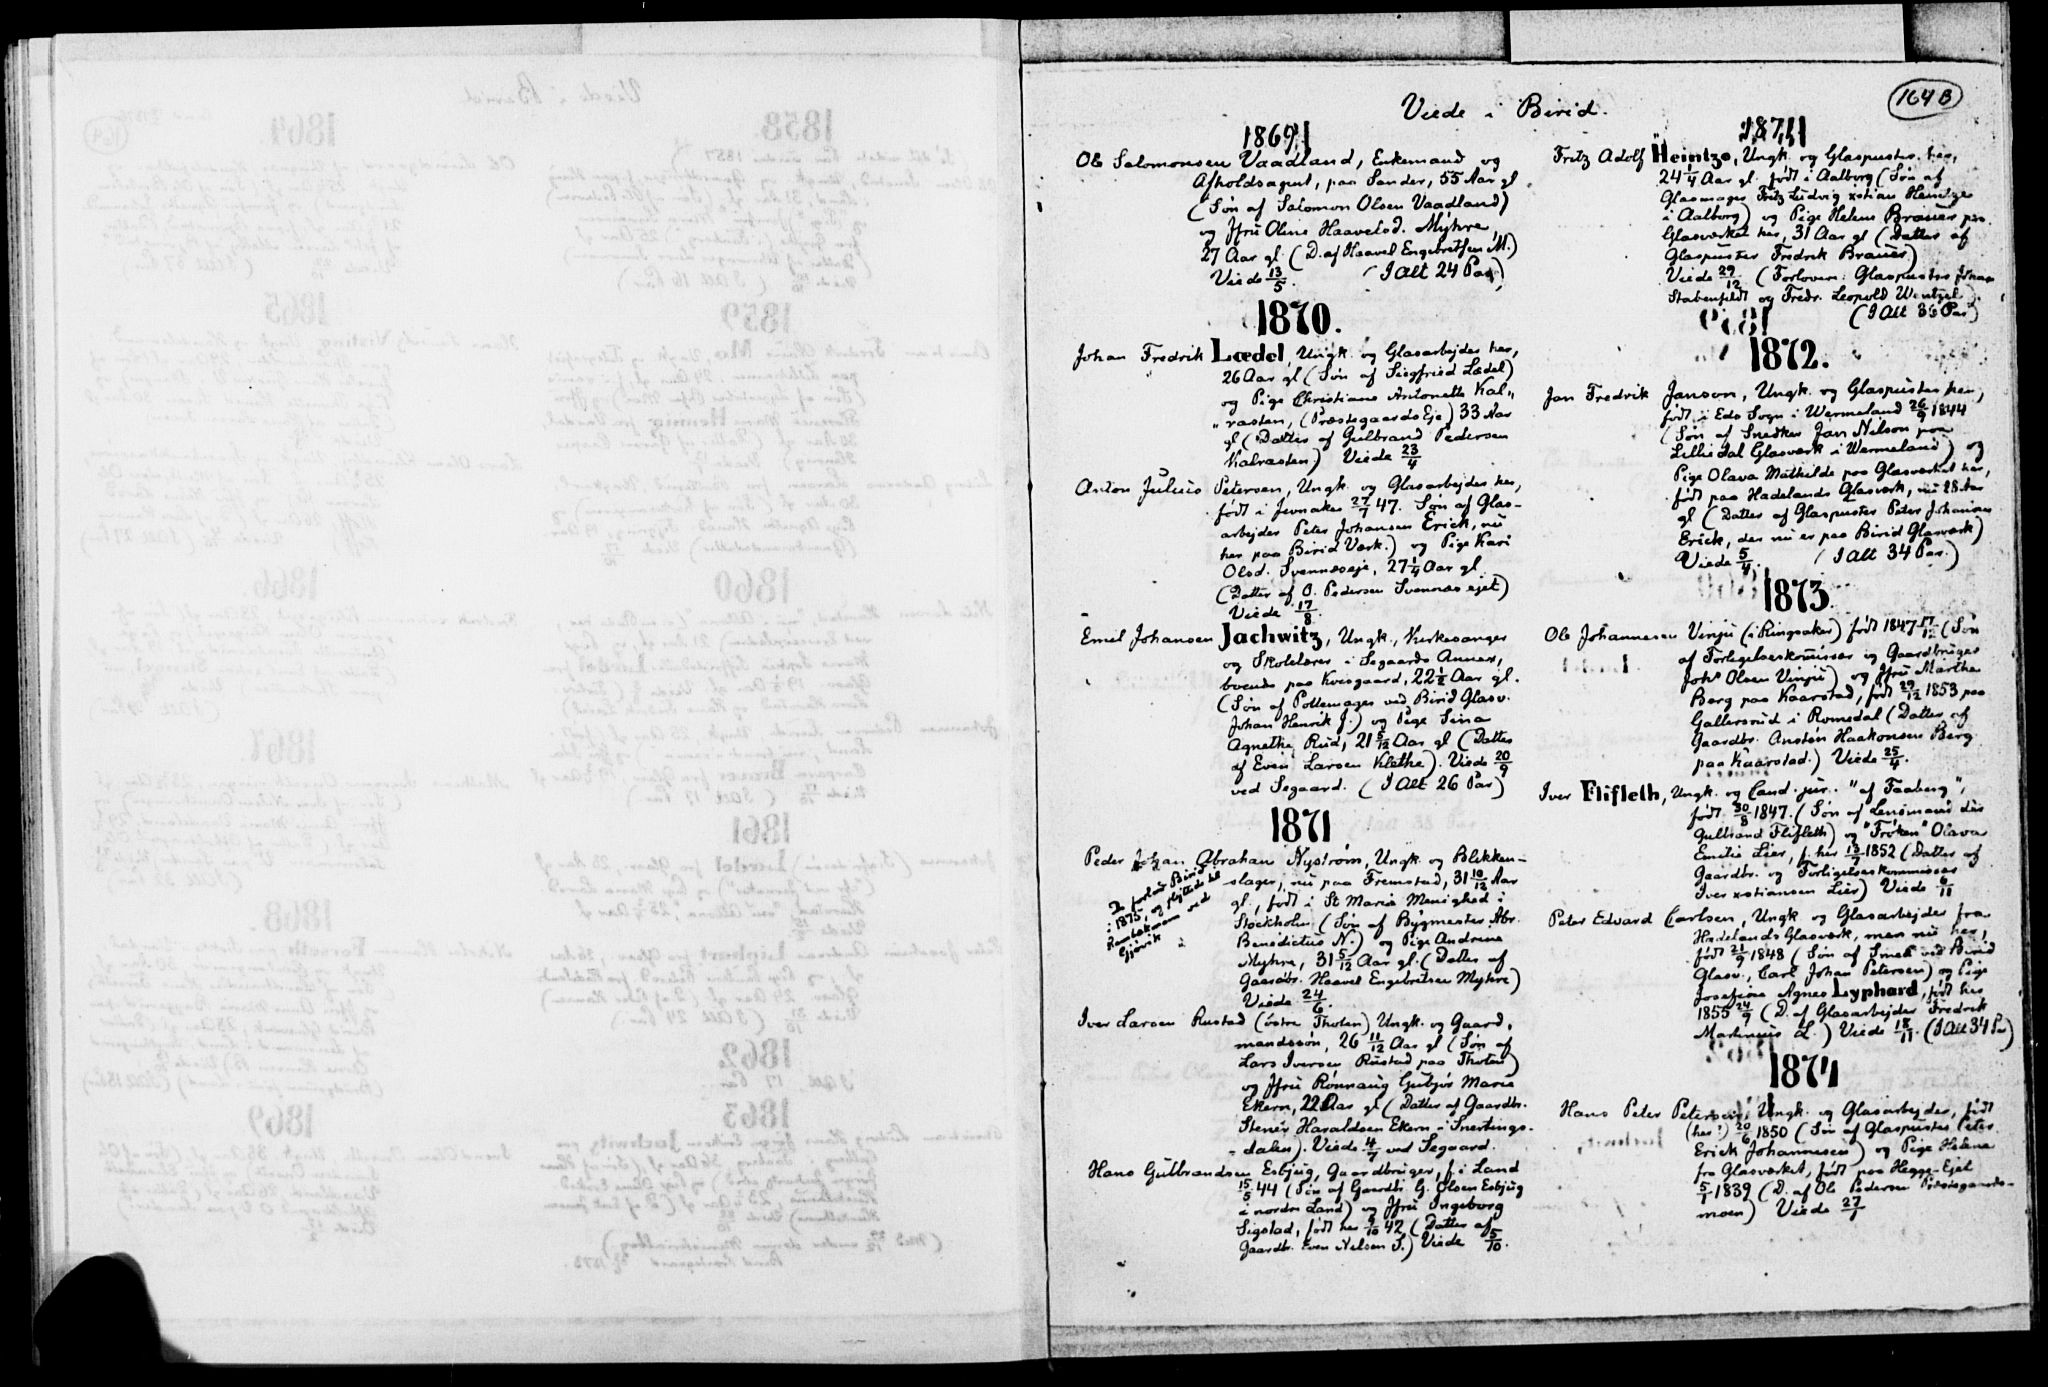 SAH, Biri prestekontor, Ministerialbok, 1730-1879, s. 164b